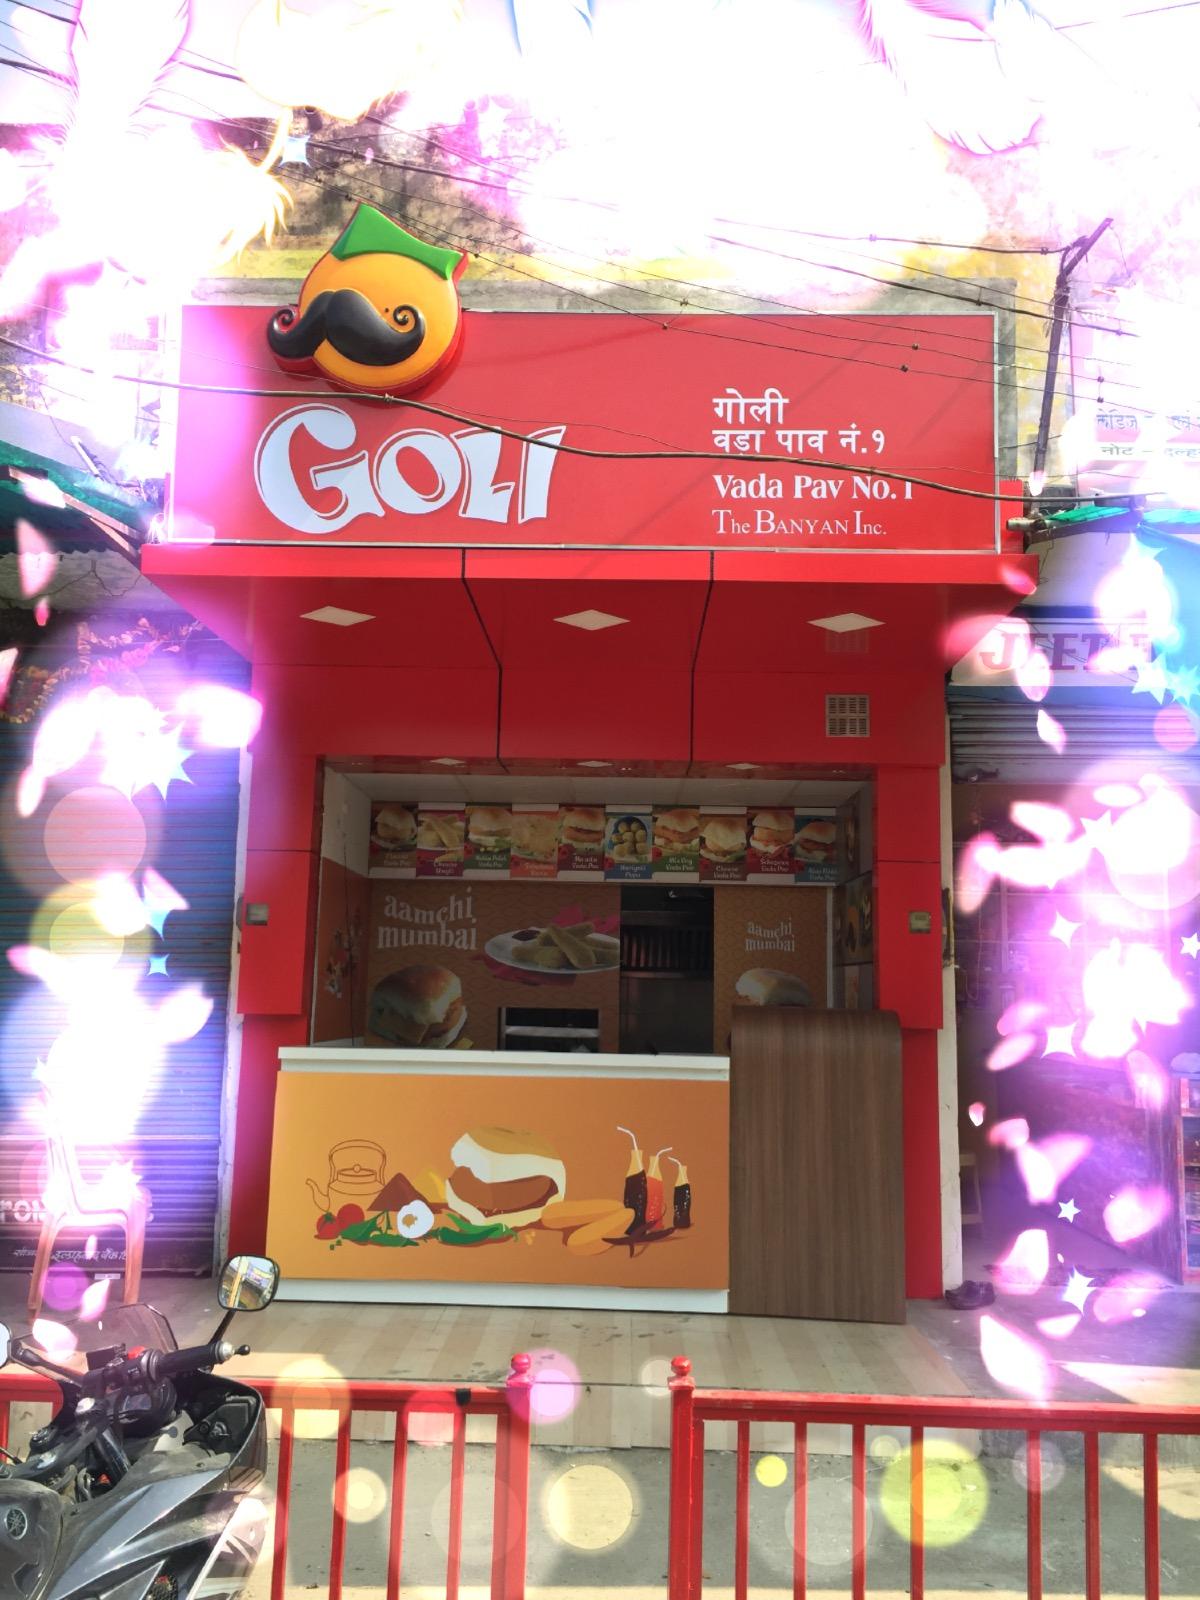 Goli Vadav Pav Franchisee business for sale in Madhya Pradesh